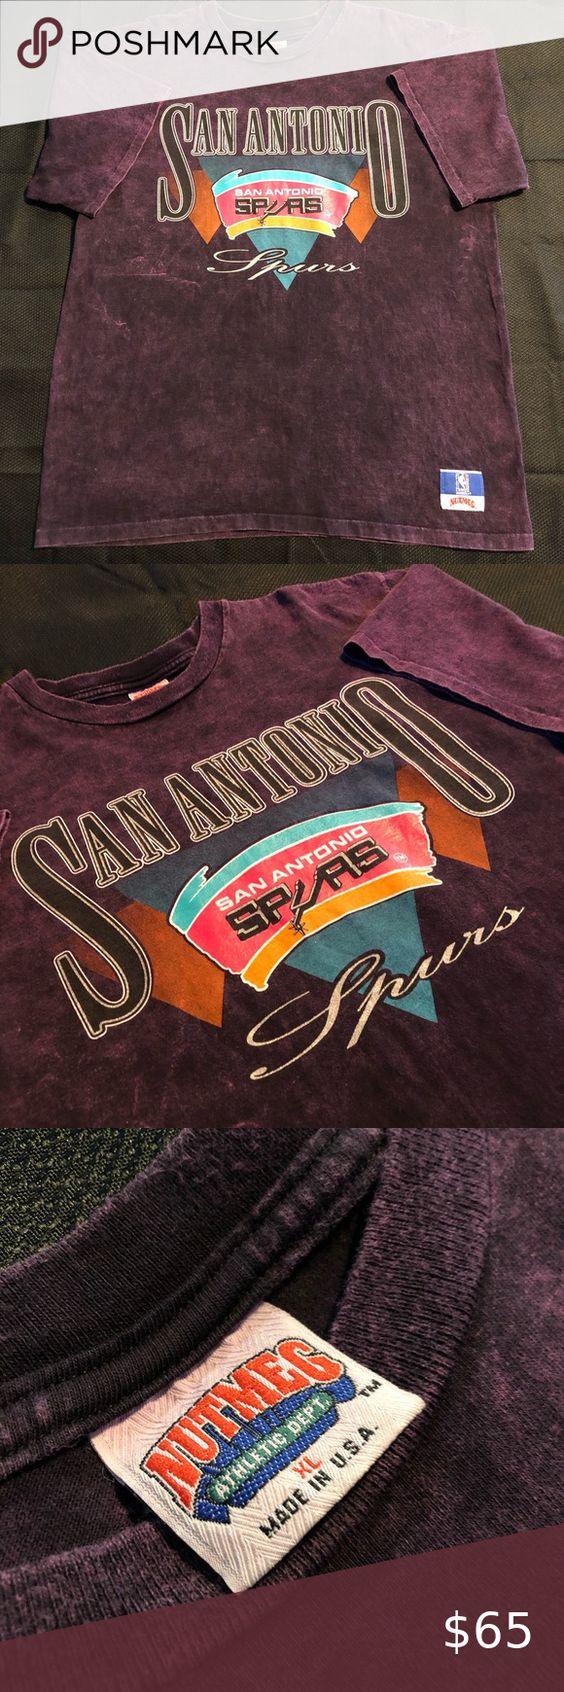 Vintage San Antonio Spurs Shirt Spurs Shirt Camouflage T Shirts Vintage Shirts [ 1692 x 564 Pixel ]